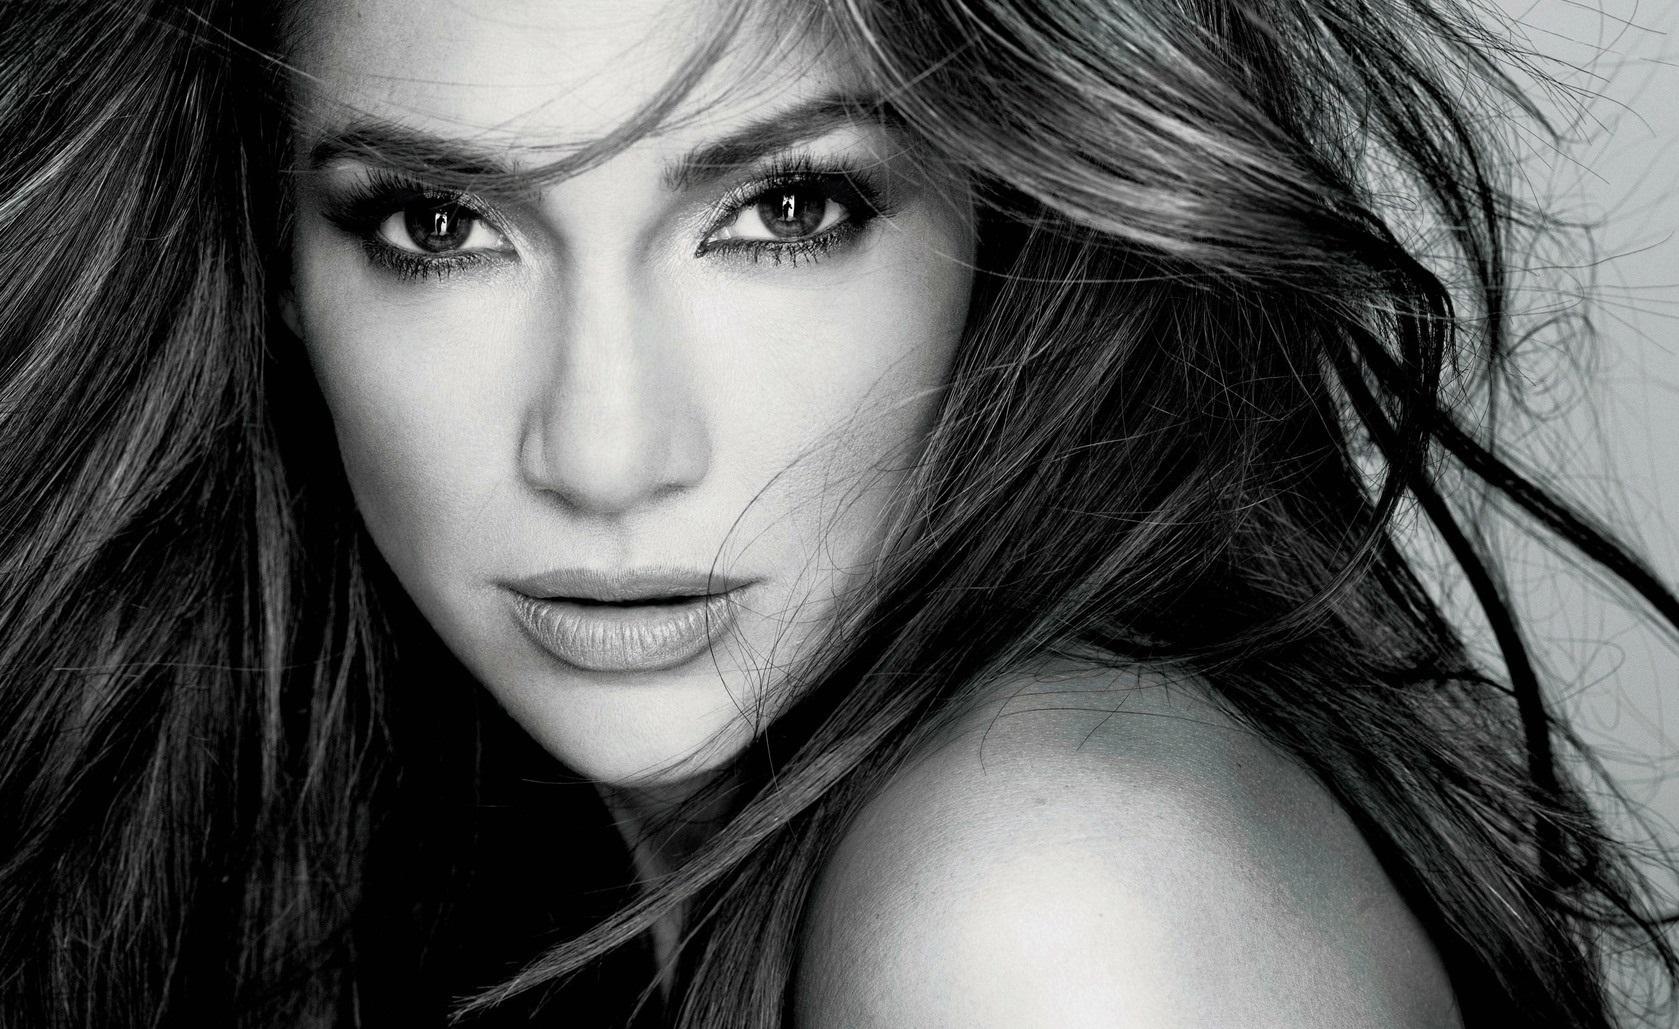 Jennifer Lopez Wallpaper 33